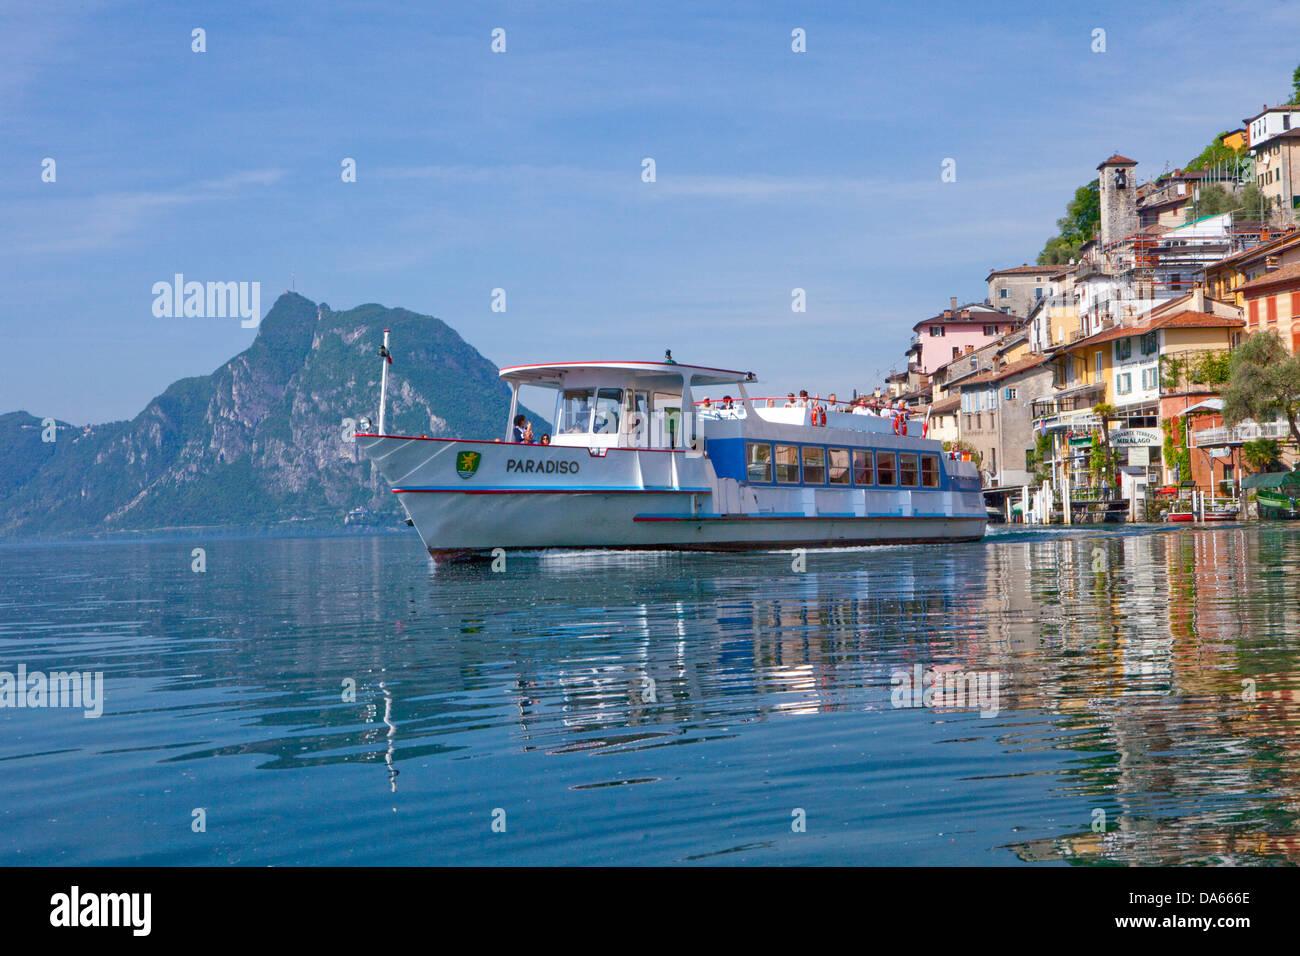 Ship, Gandria, canton, TI, Ticino, South Switzerland, water, lake, lakes, village, boat, ships, boats, Switzerland, - Stock Image